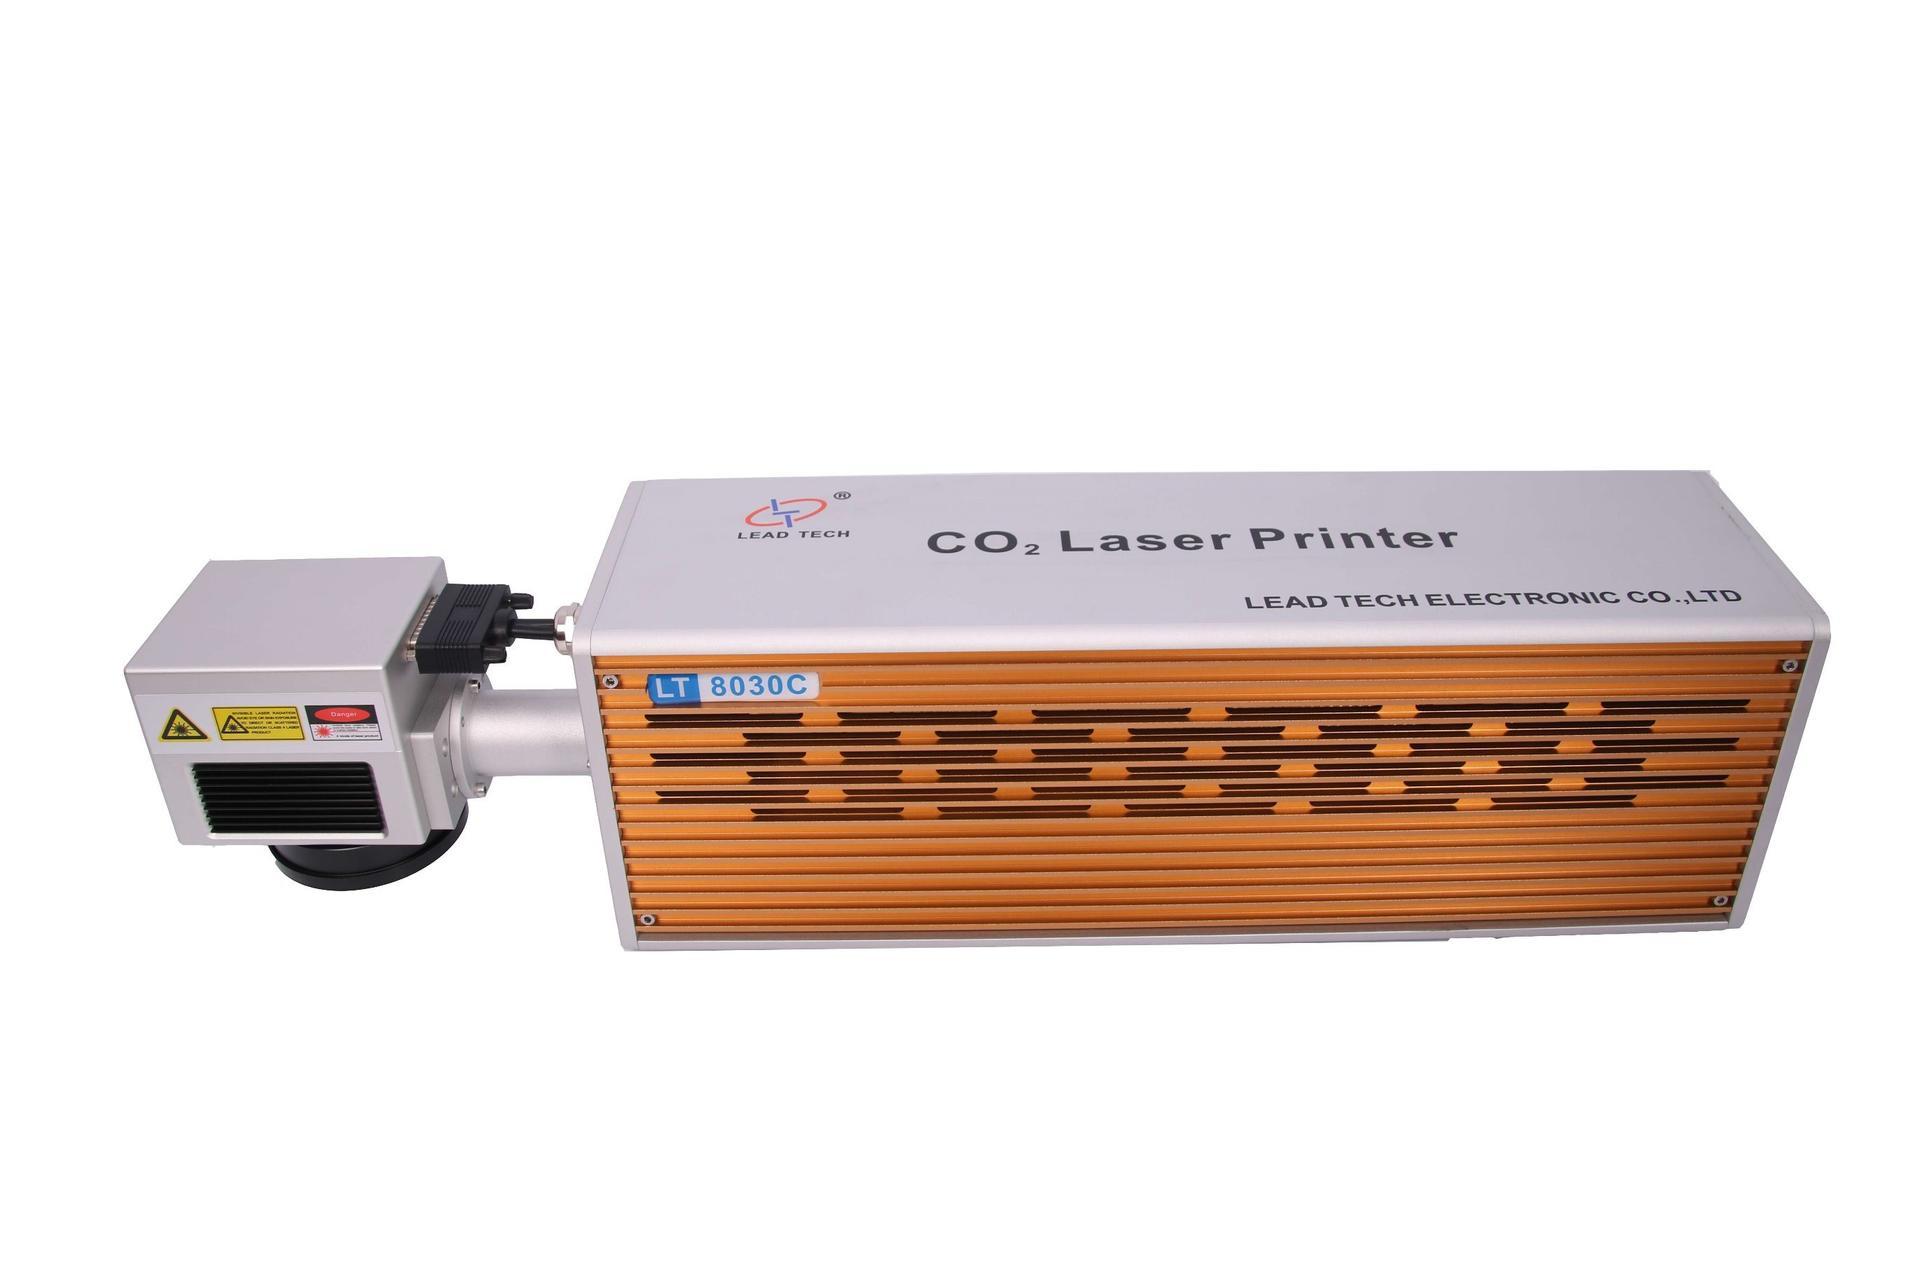 Lt8030c CO2 High Performance Economic PP Film Laser Marking Printer